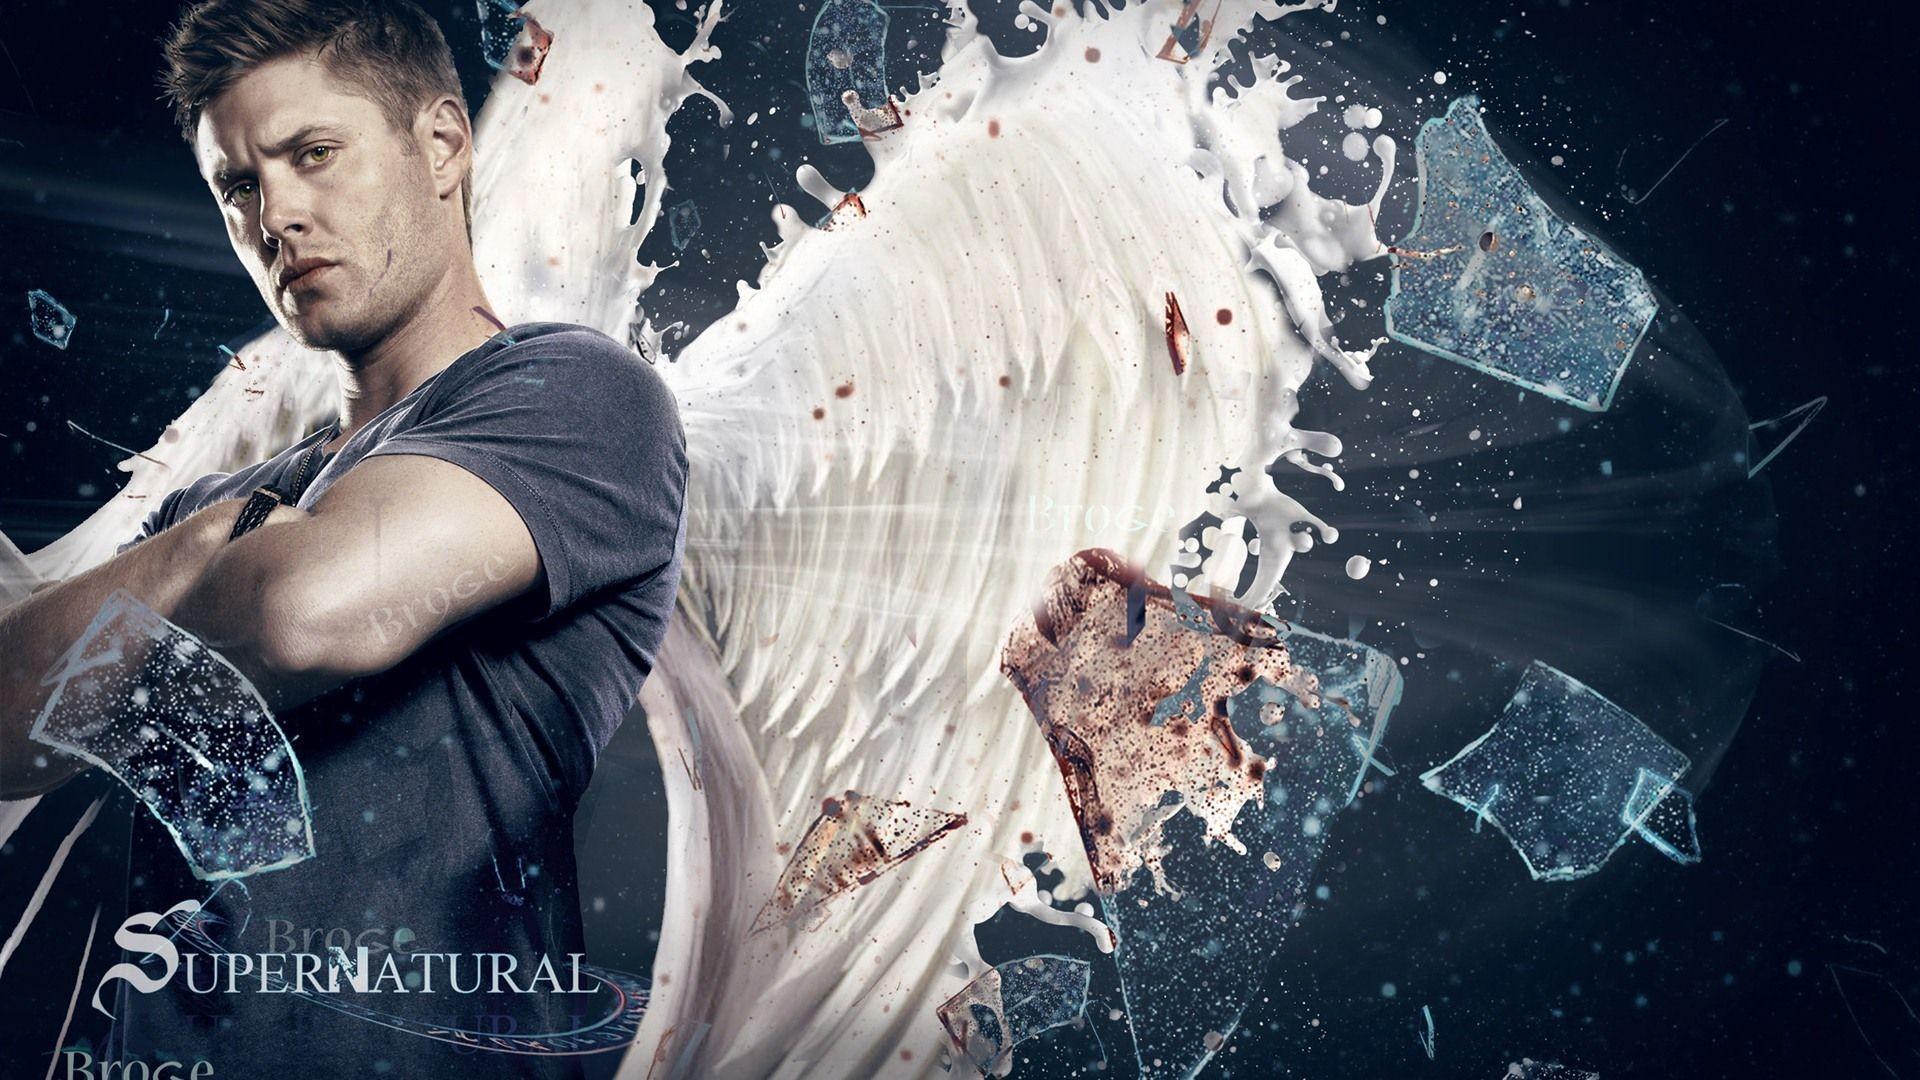 supernatural-desktop-wallpapers-hd-1920×1080-dean.jpg